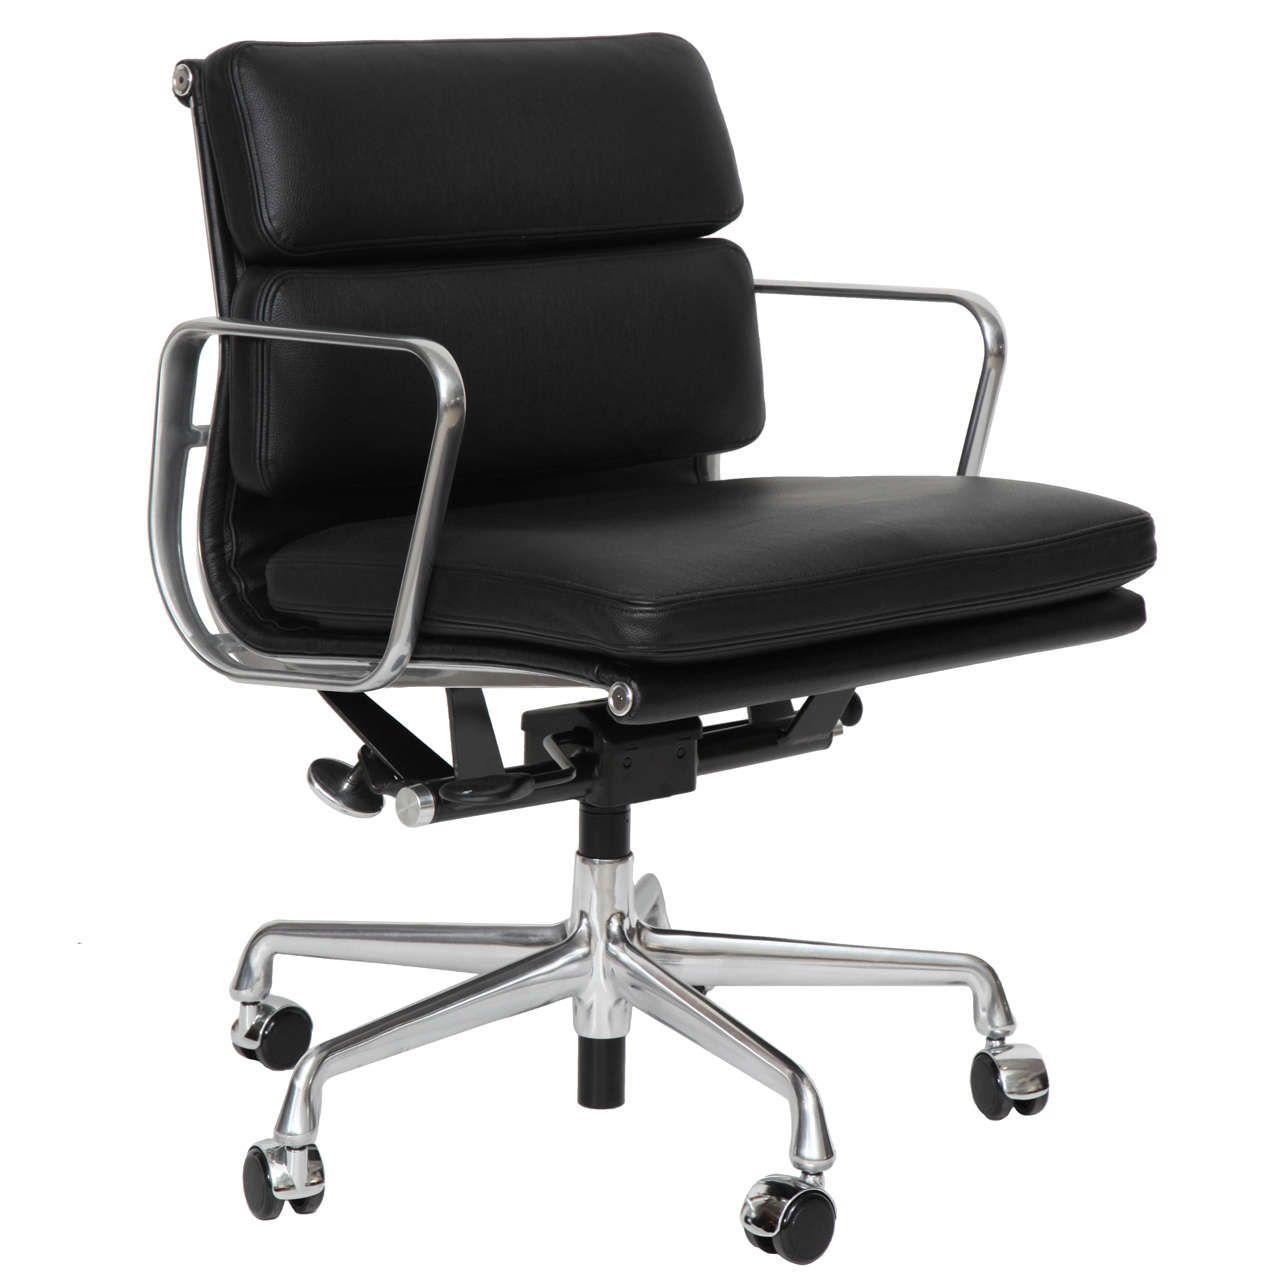 eames management chair soft pad